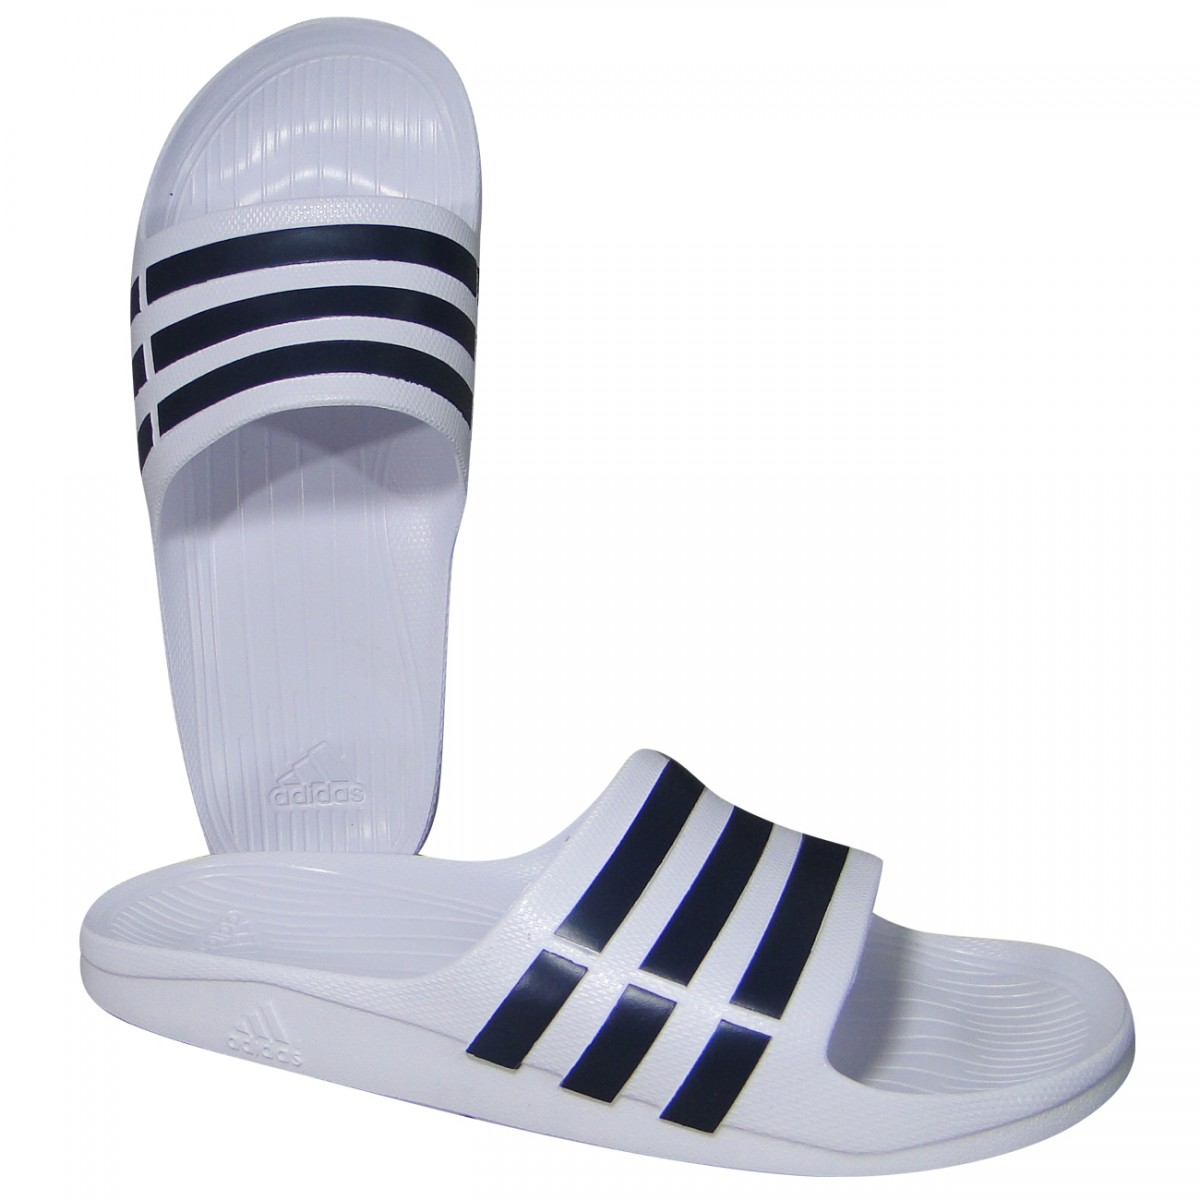 d410a3efb Chinelo Adidas Duramo Slide F32892 - Branco/Preto - Chuteira Nike ...